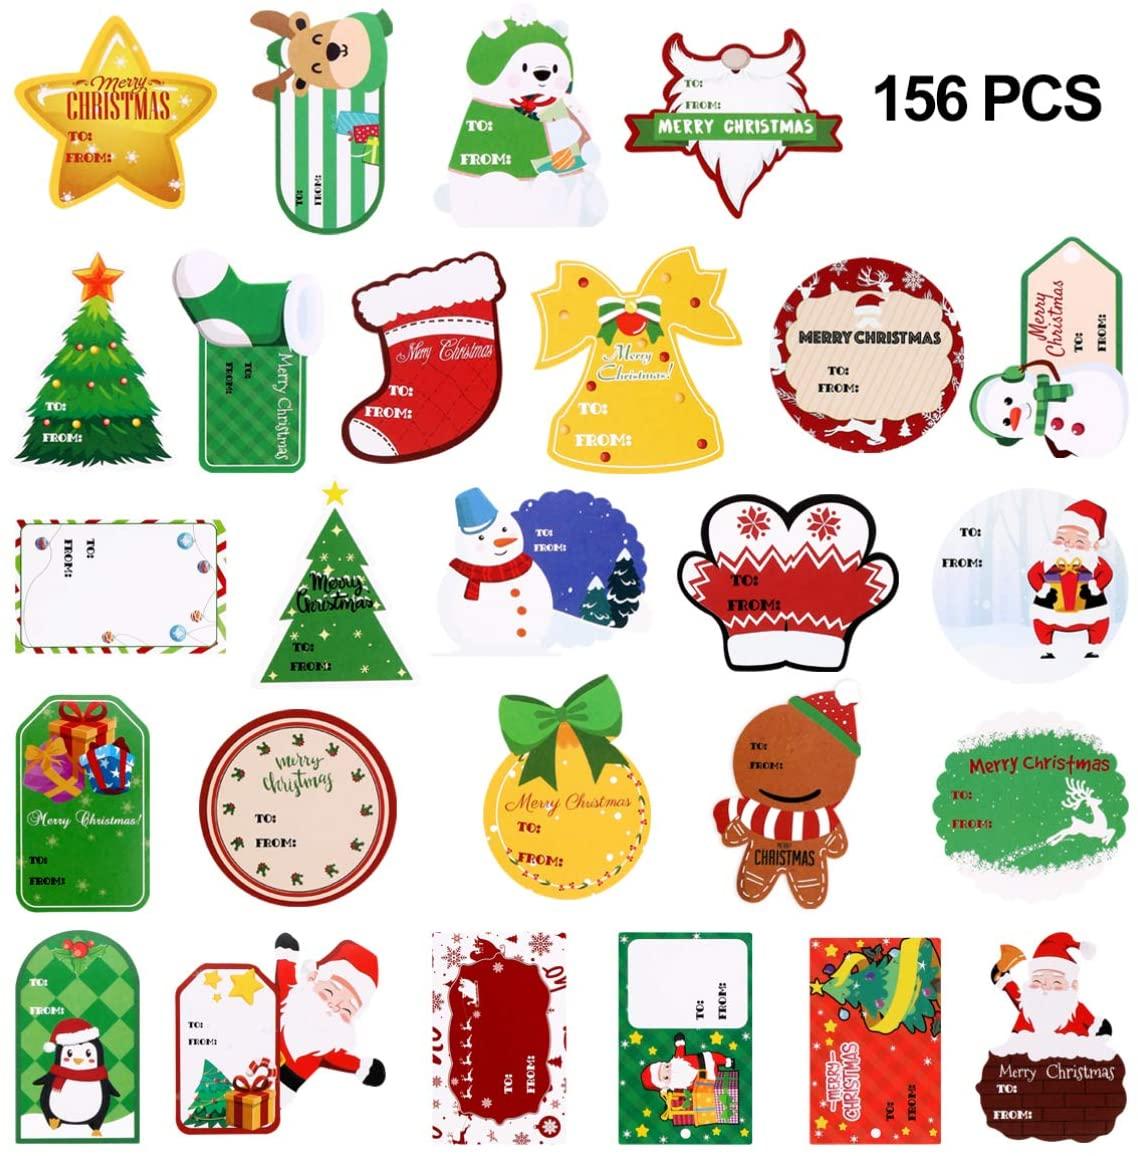 KESYOO 156PCS Tag Stickers 26 Sheet Self Adhesive Xmas Tag Stickers Snowmen Name Tag Stickers for Festival Presents Labels Decals, Christmas Holiday Decor